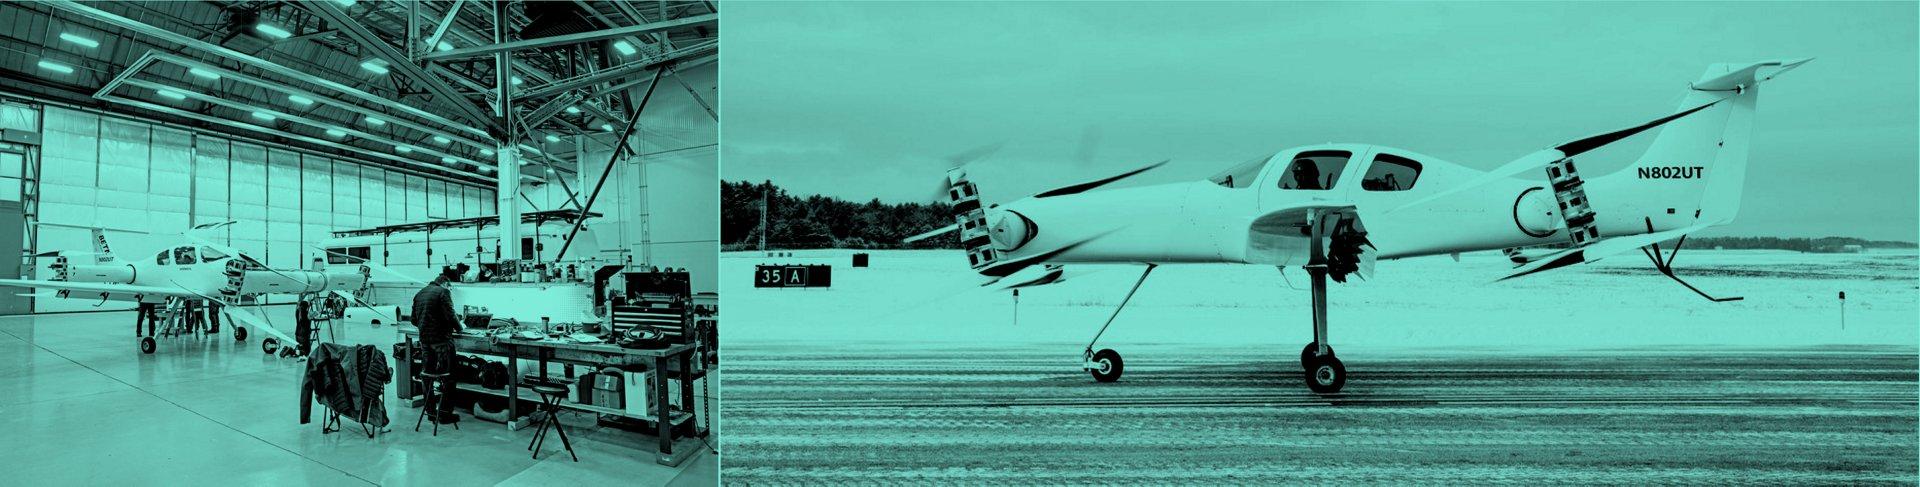 Air Race E Team Blue BETA Racing Electric Flight Hangar